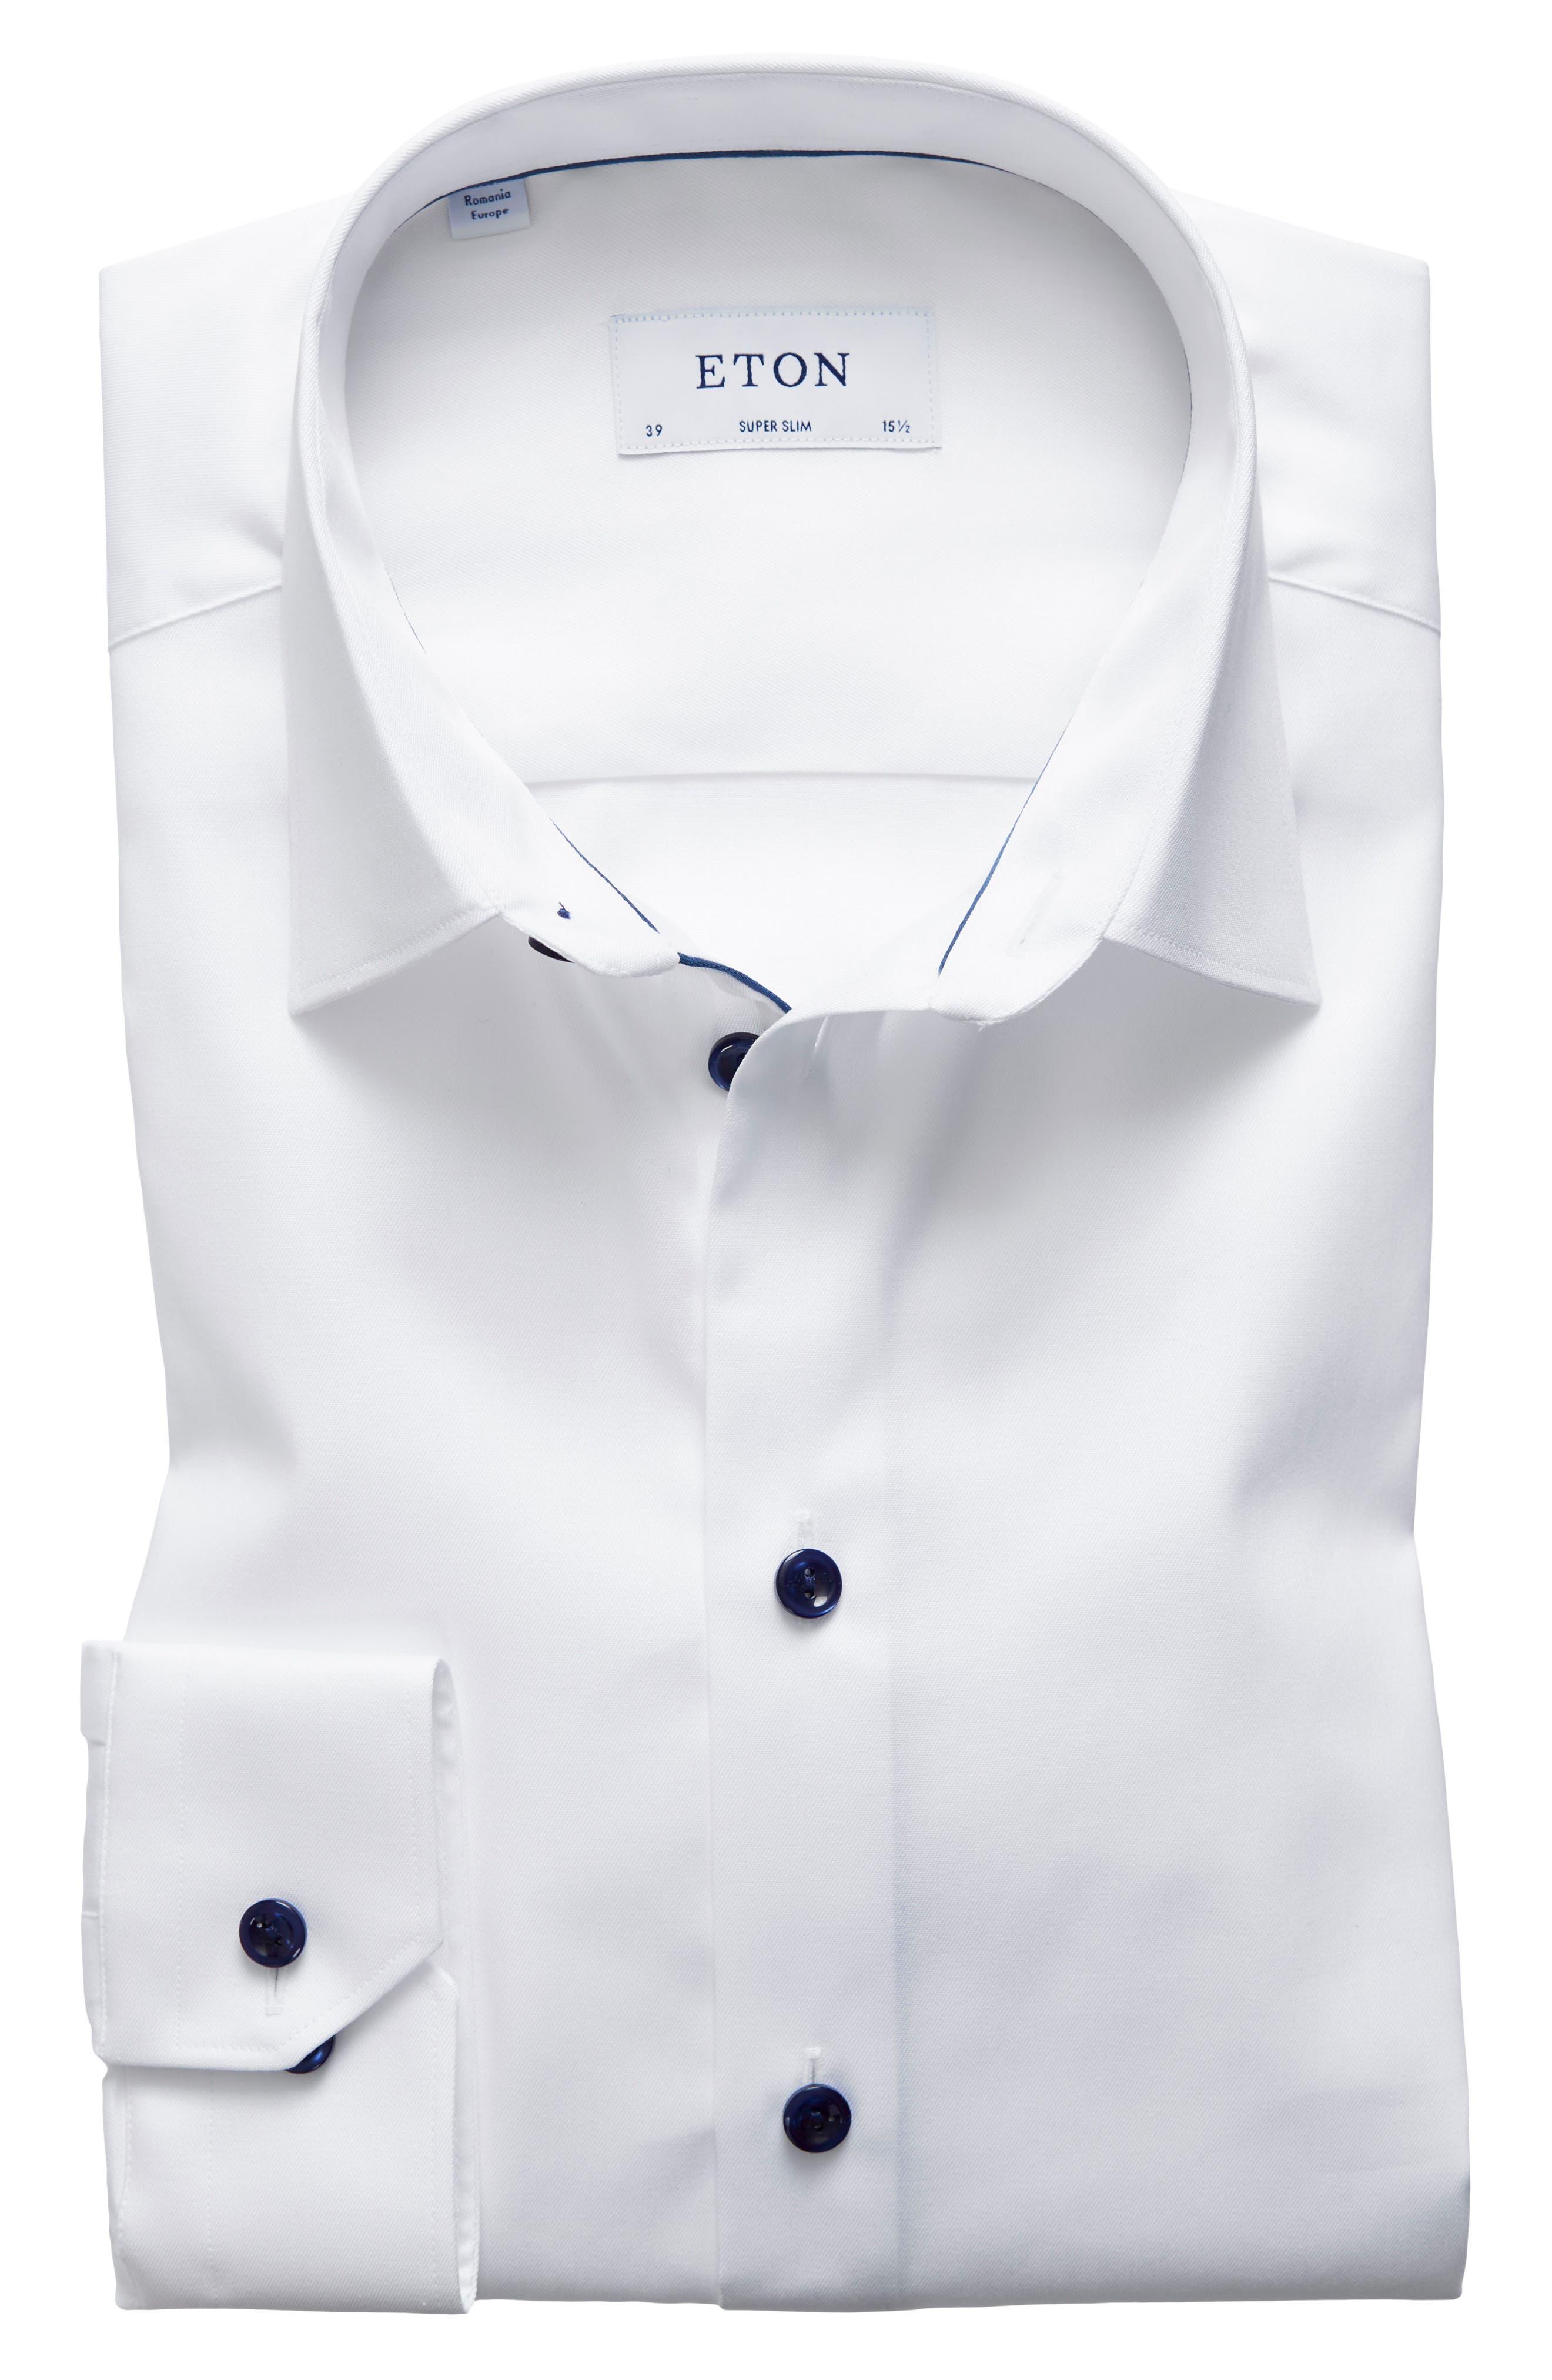 Main Image - Eton Super Slim Fit Twill Dress Shirt with Navy Details